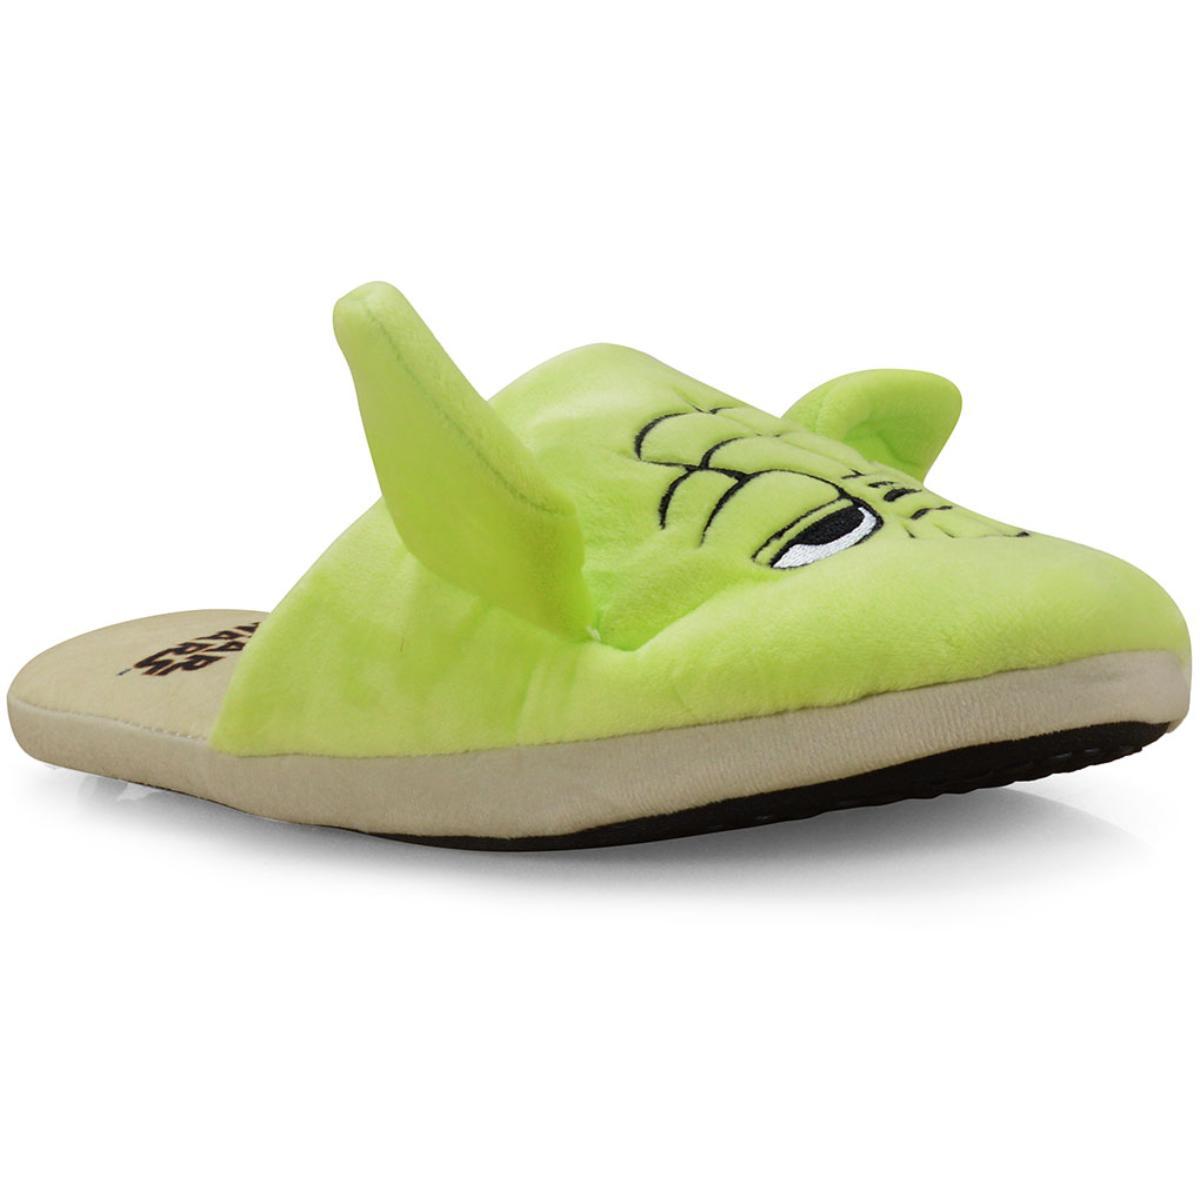 Chinelo Masc Infantil Ricsen 139034 3d Yoda Verde